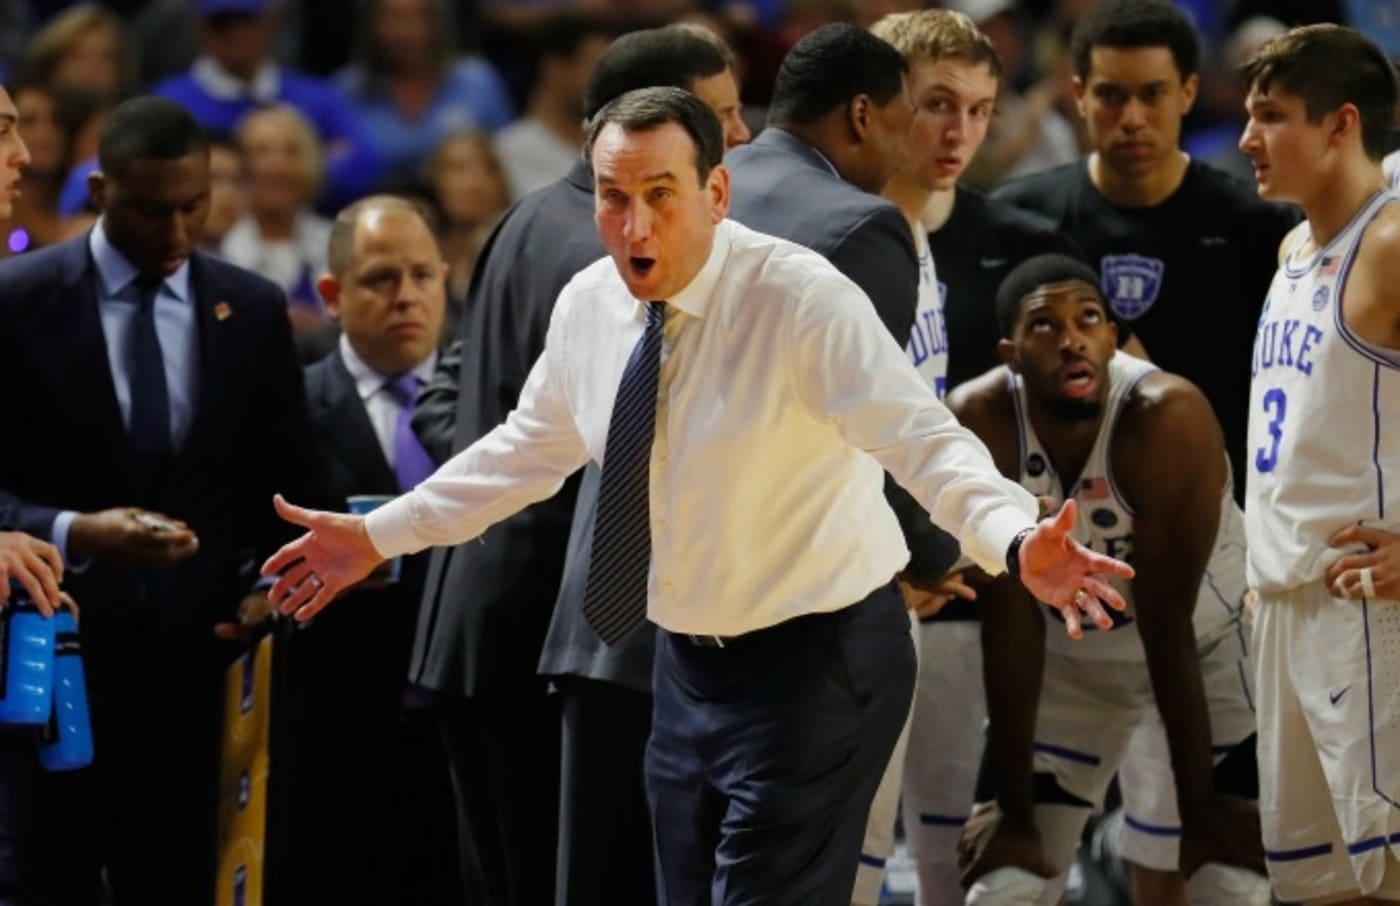 Mike Krzyzewski reacts to a call during a Duke/South Carolina game.